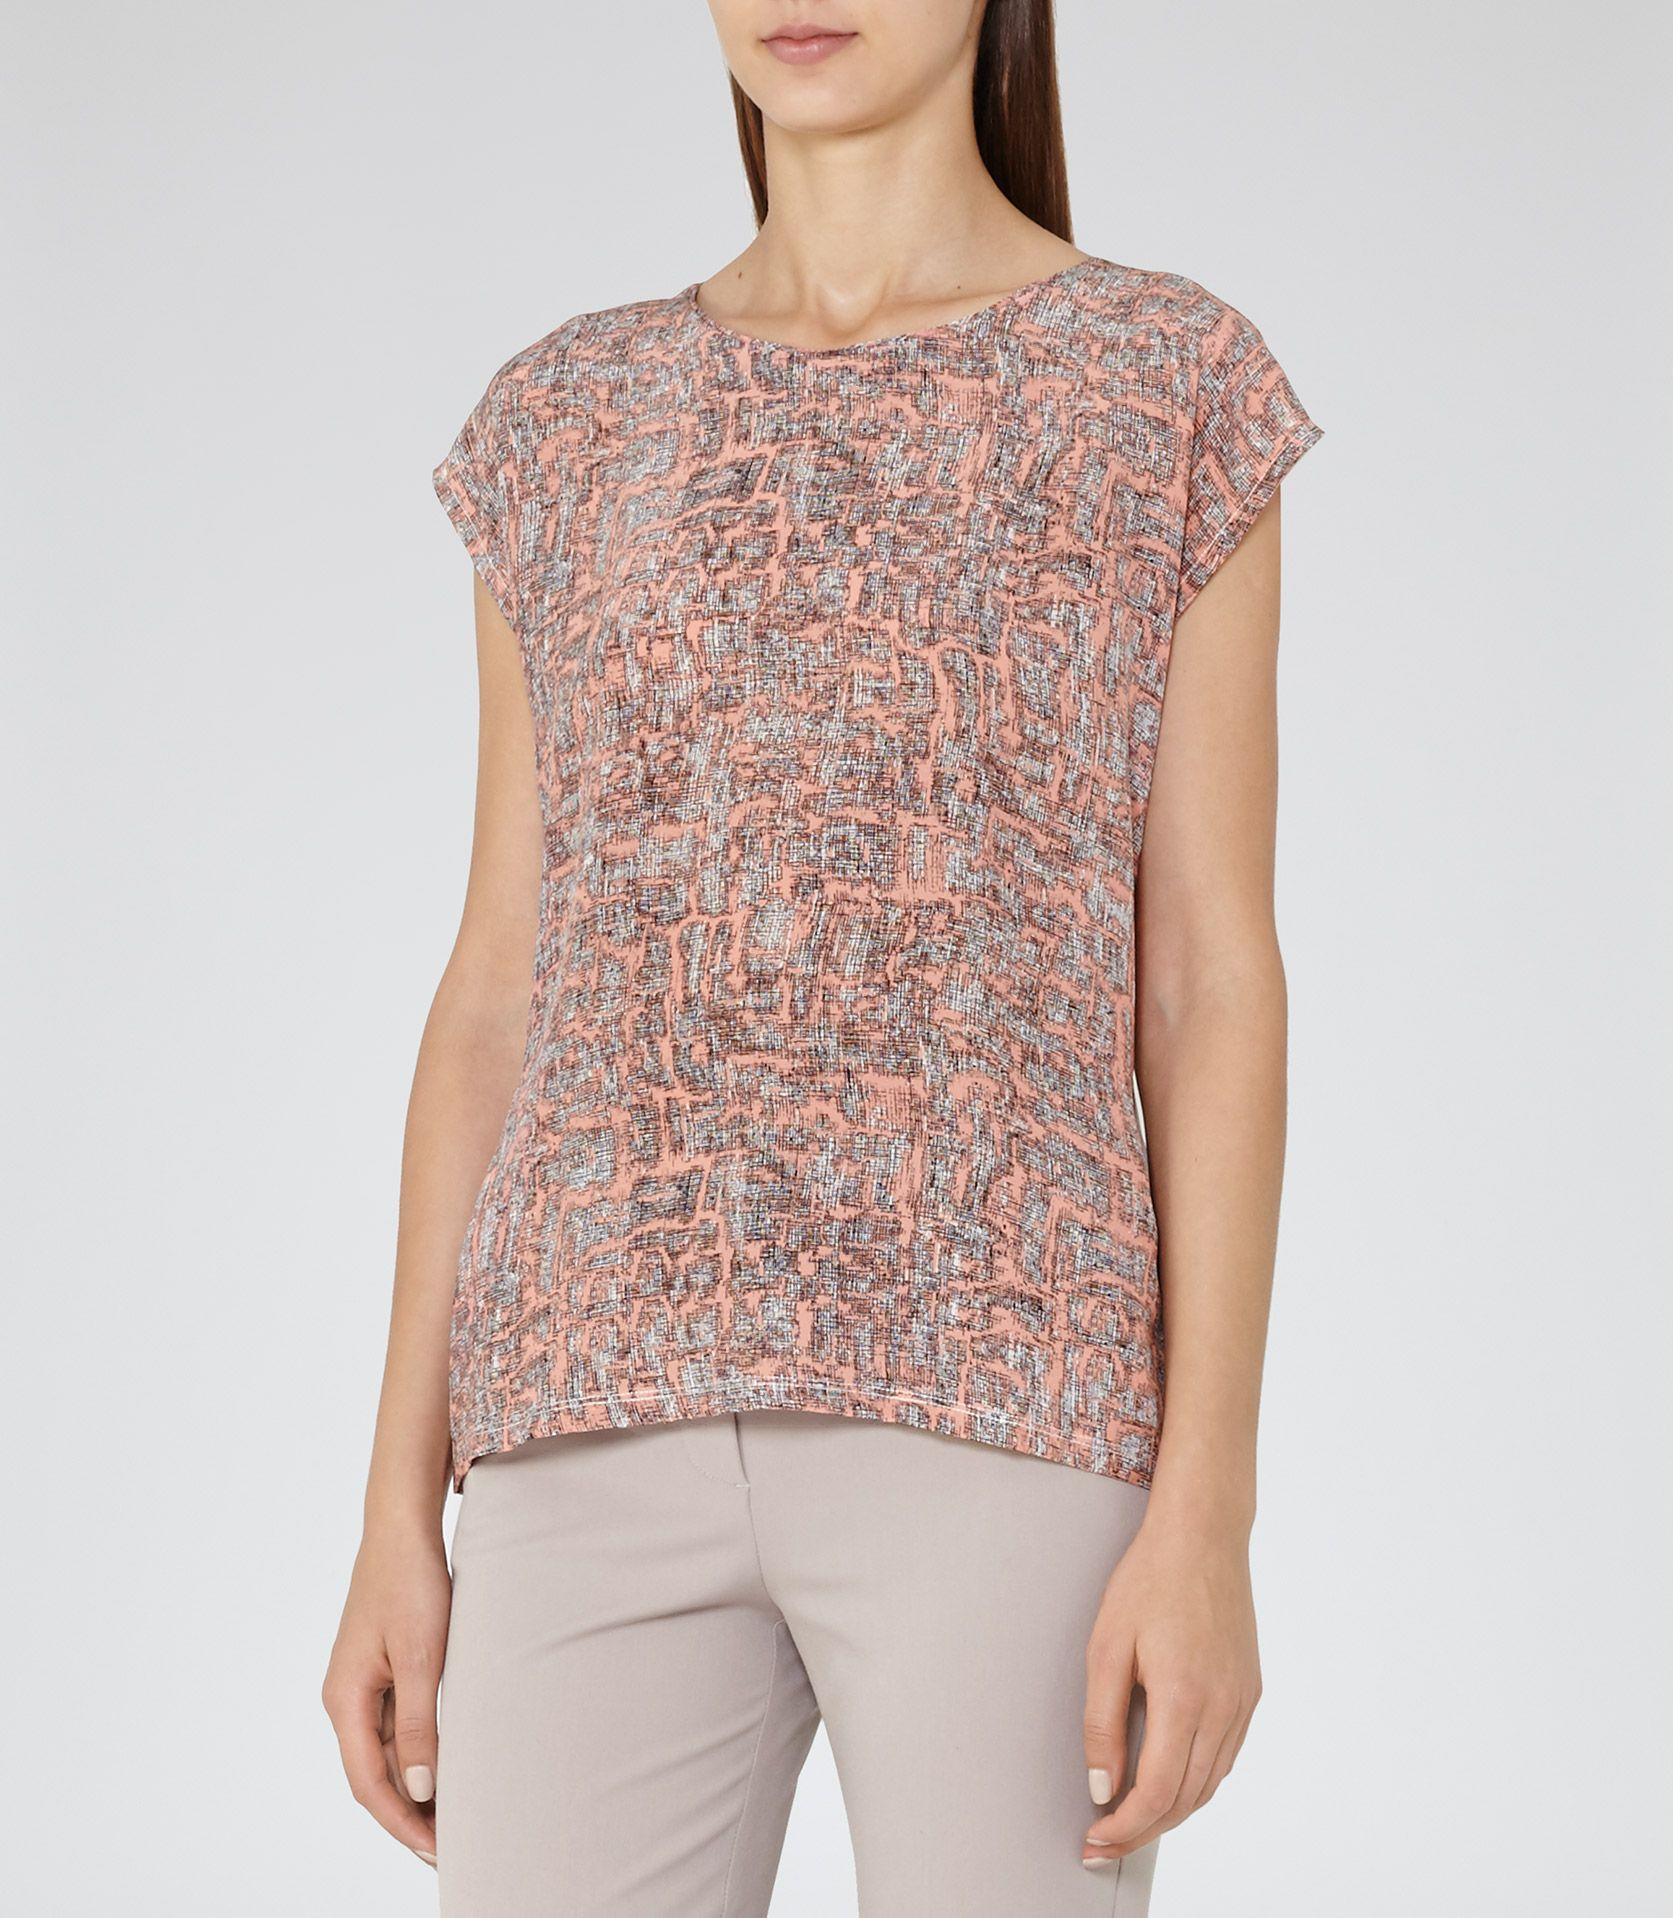 Black t shirt reiss - Womens Coral Black Printed Silk Front T Shirt Reiss Coco